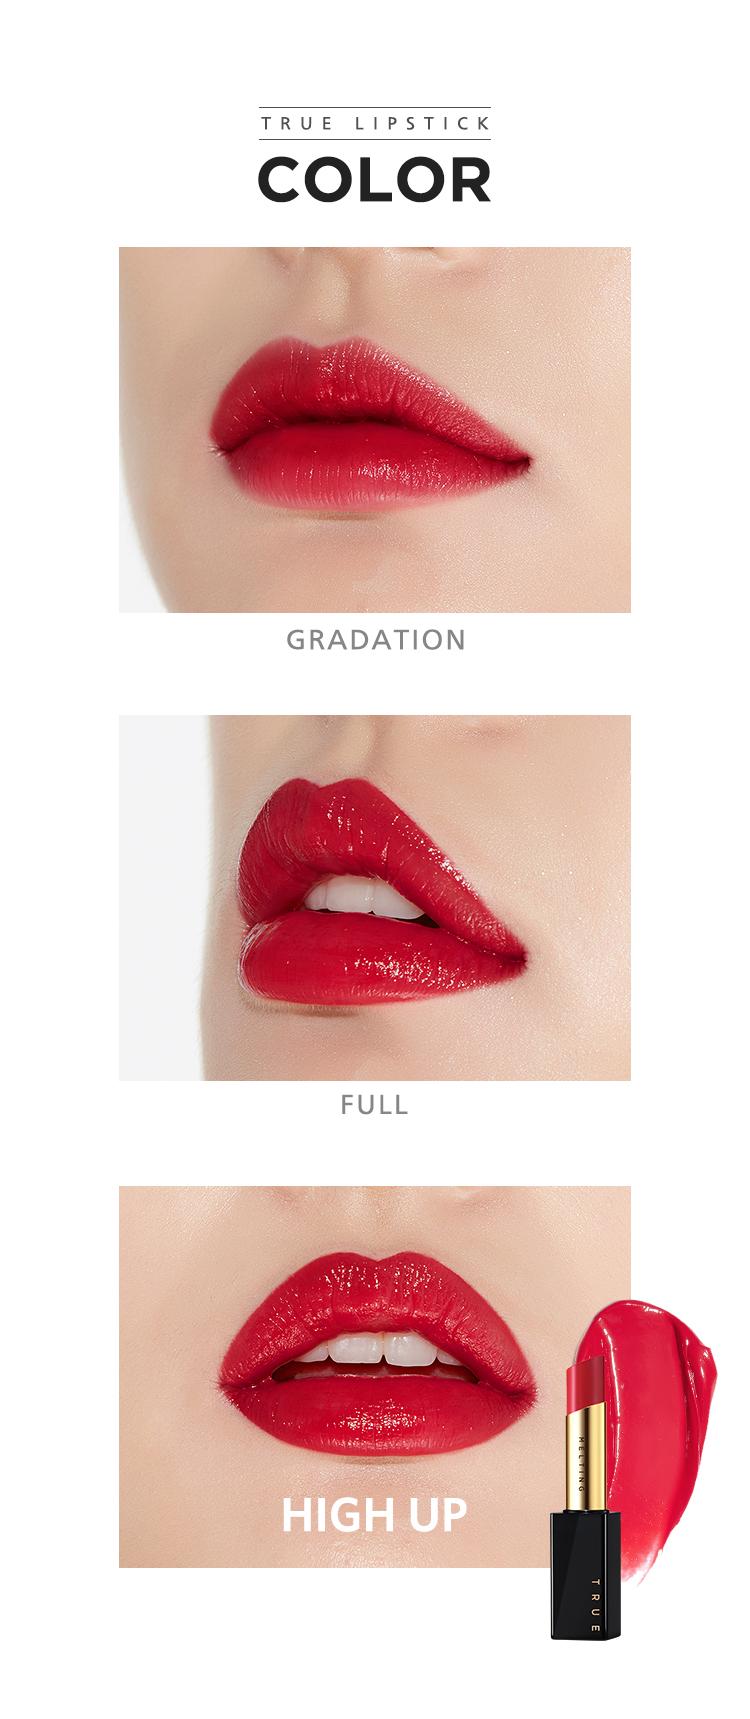 APIEU_True_Melting_Lipstick_bf_RD01_02.jpg